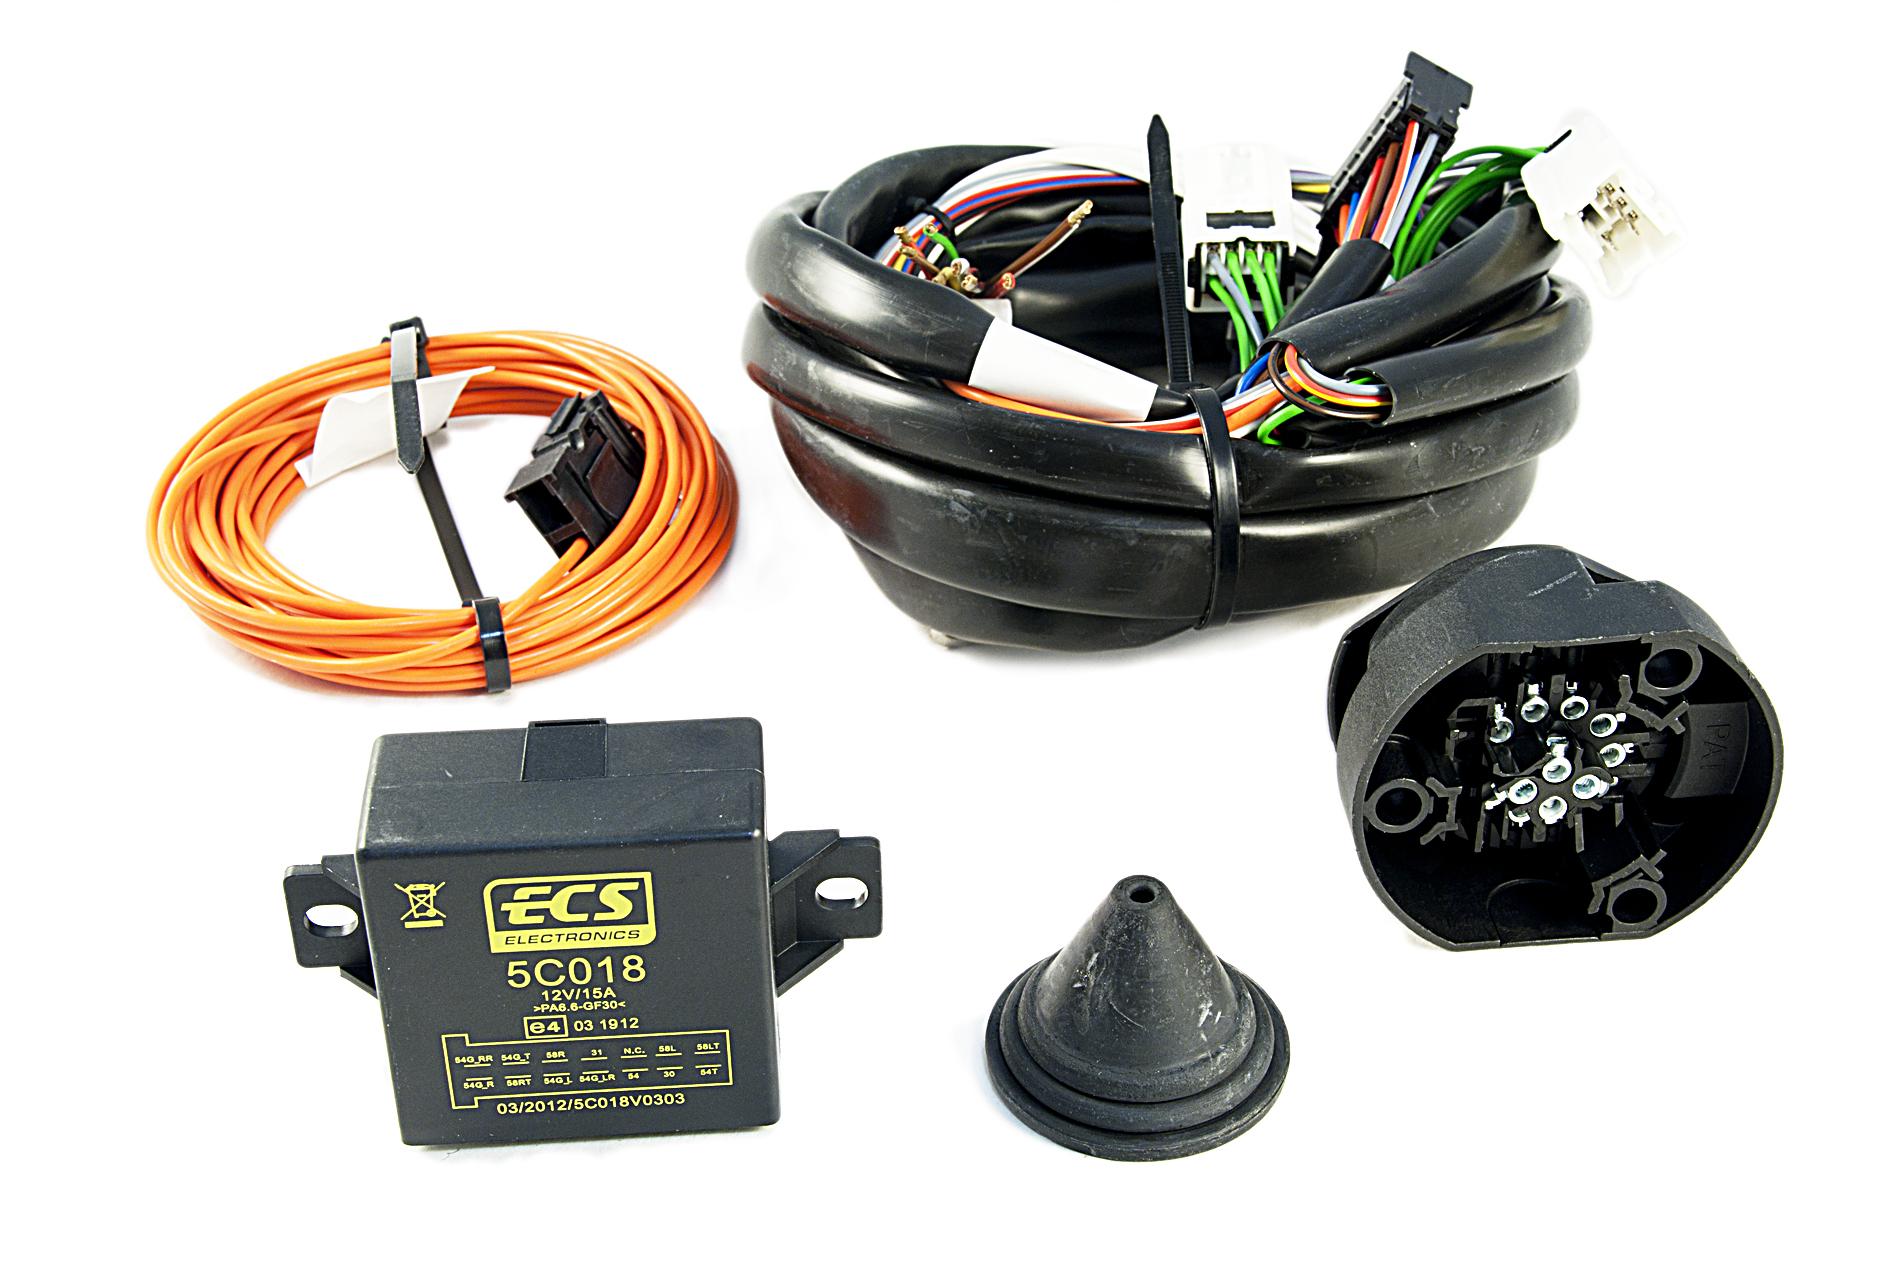 nissan genuine 7 pin electrical kit wiring for tow bar towbar hitch ke505jg307 ebay